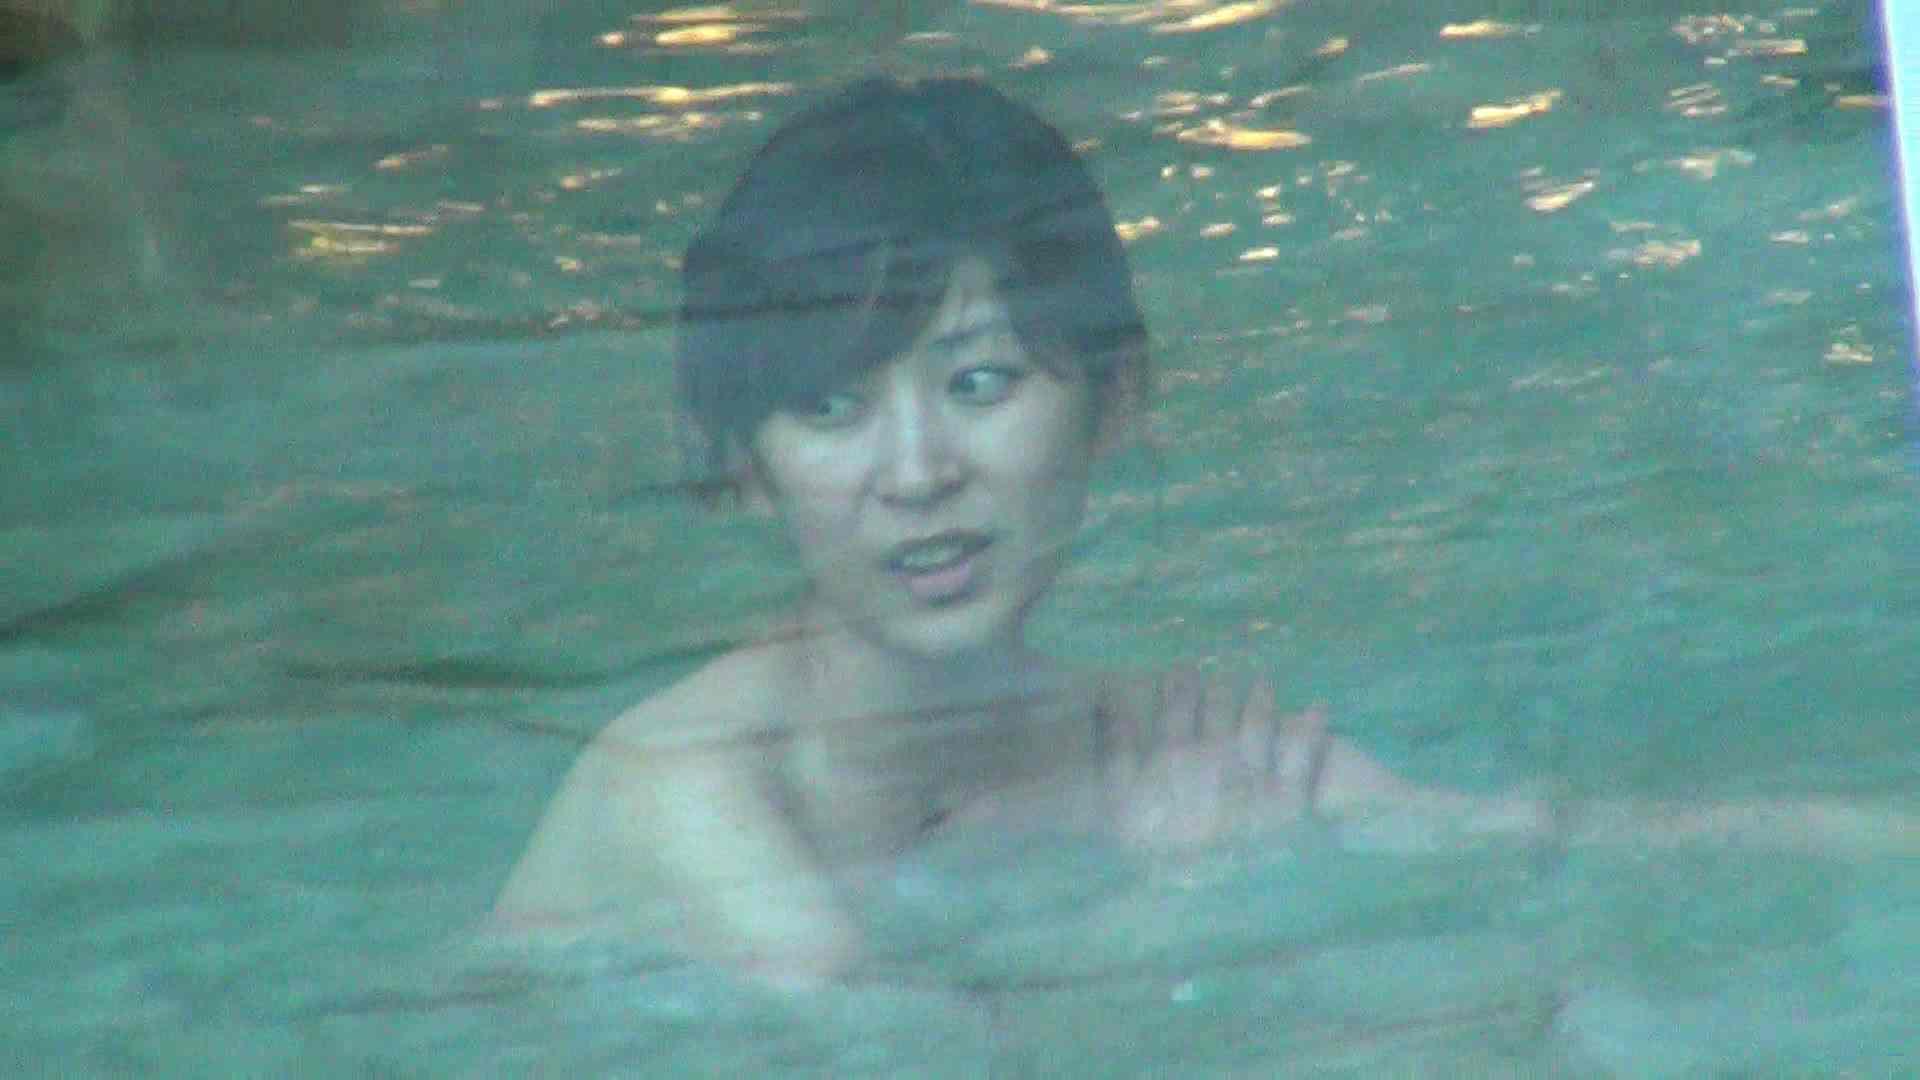 Aquaな露天風呂Vol.294 露天 セックス無修正動画無料 75画像 59